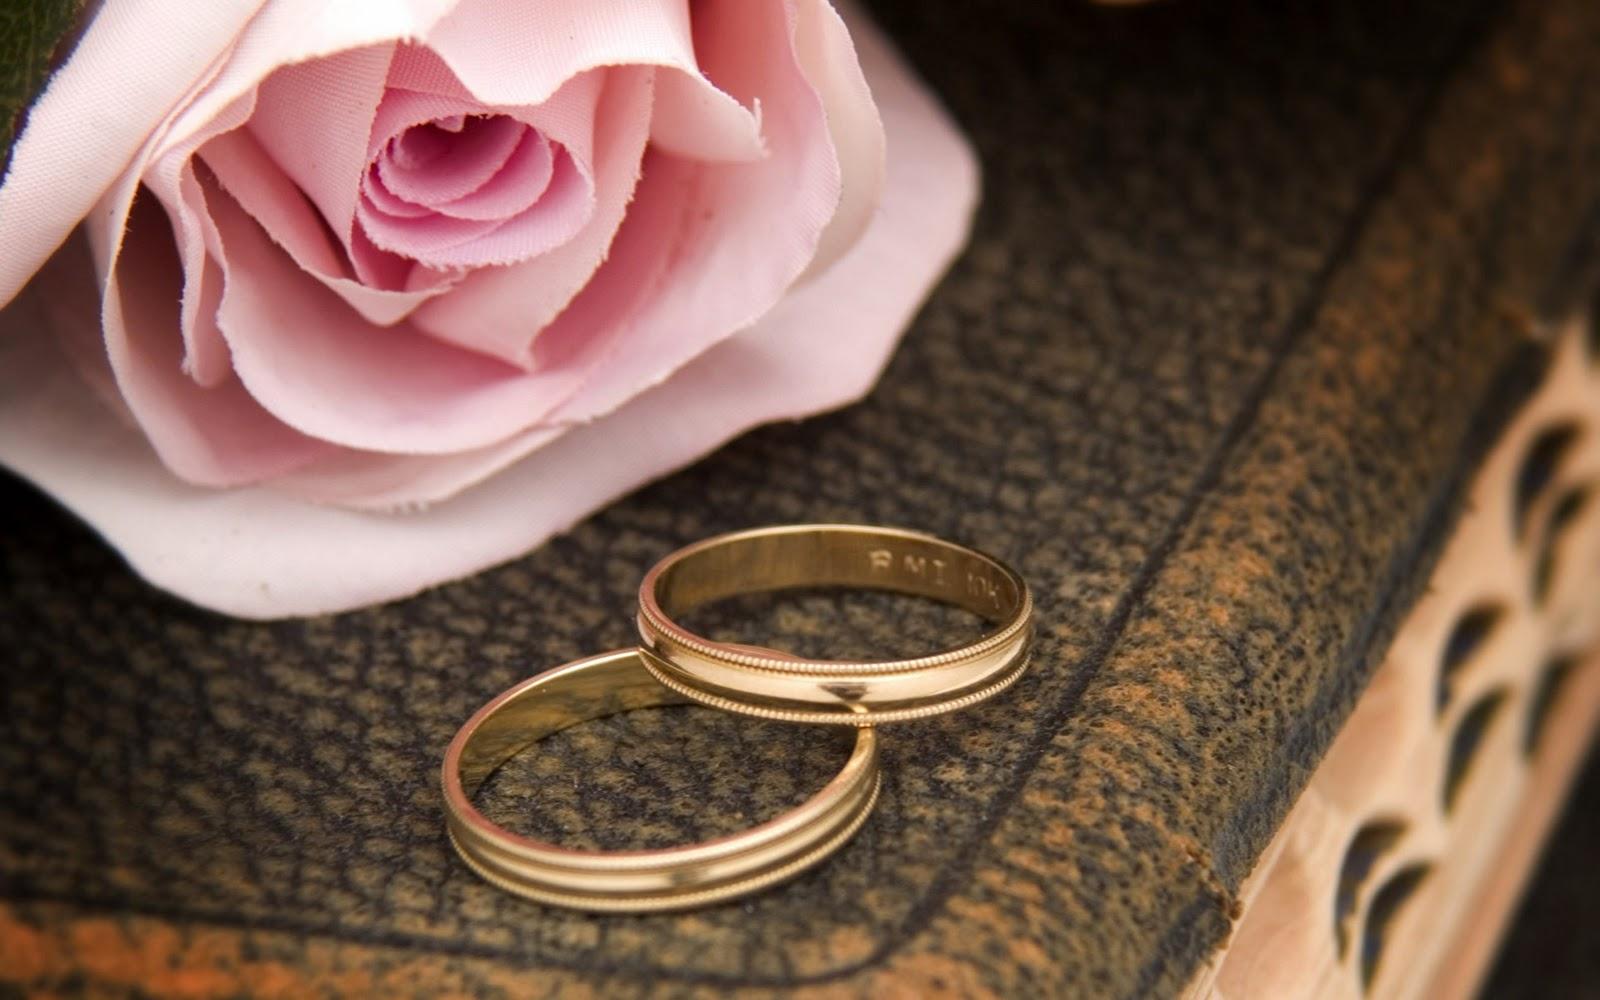 Matrimonio Catolico Y Adventista : El anillo de bodas en la historia iglesia adventista